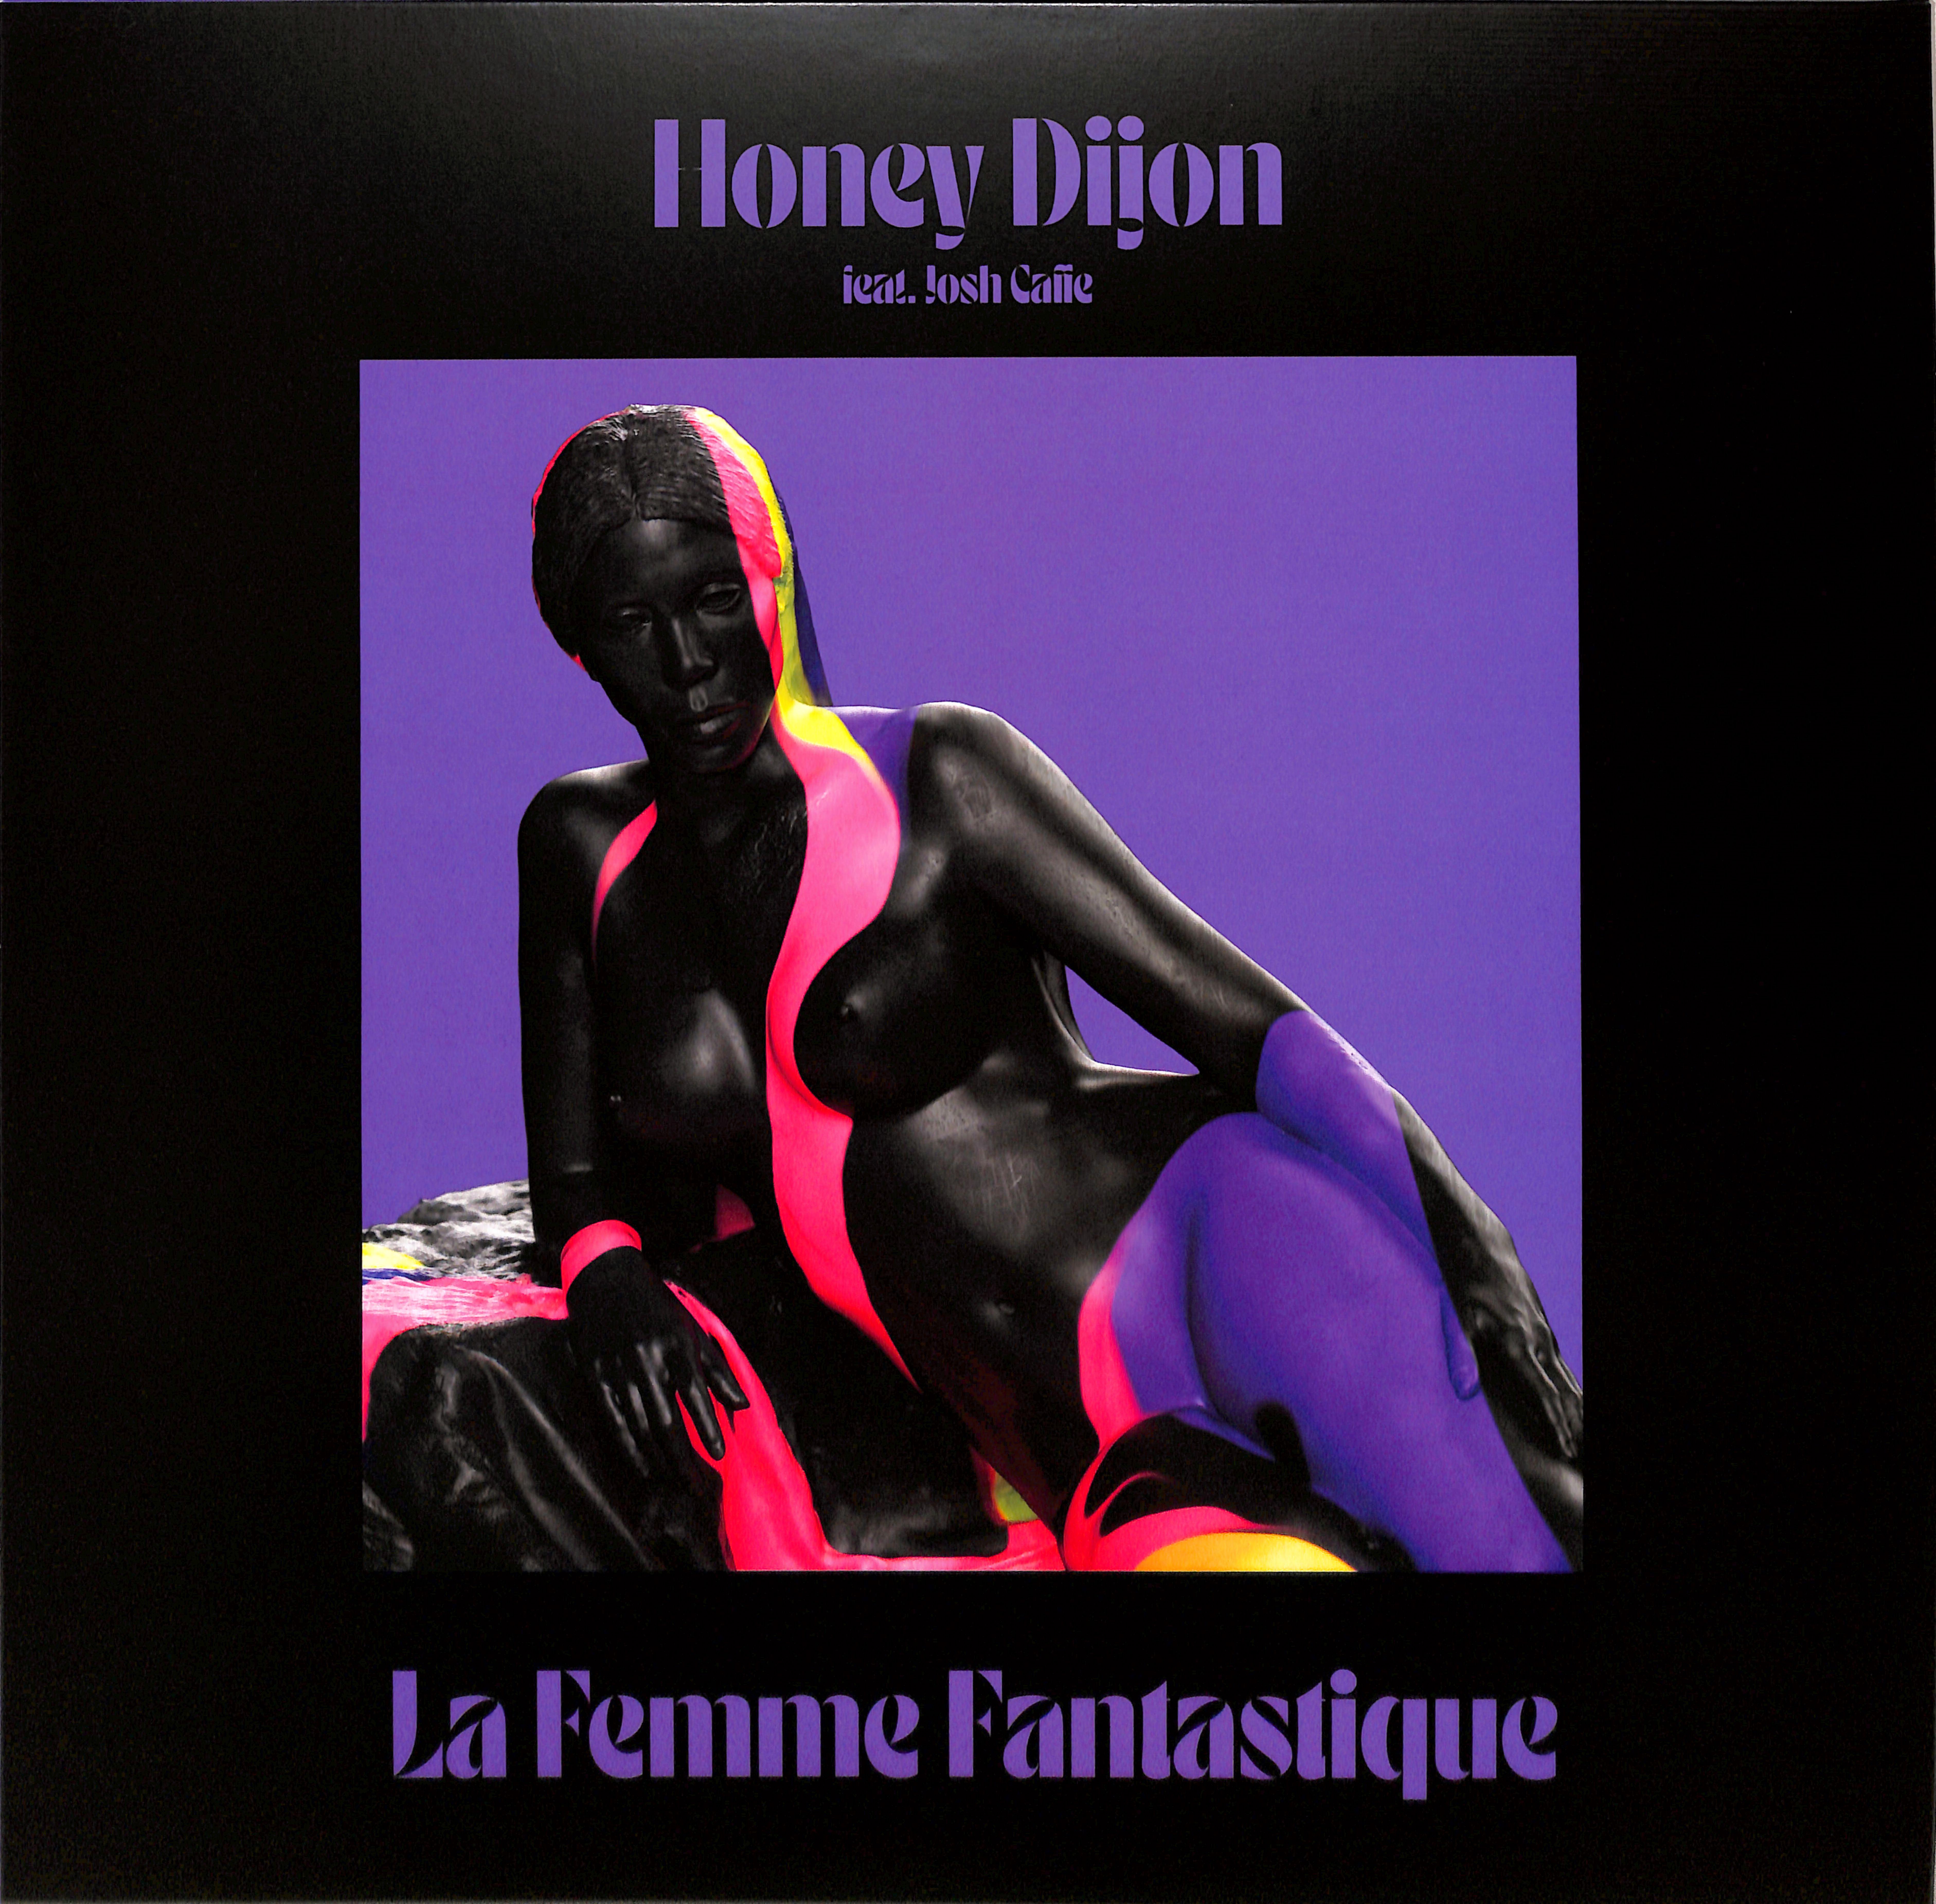 Honey Dijon featuring Josh Caffe - LA FEMME FANTASTIQUE